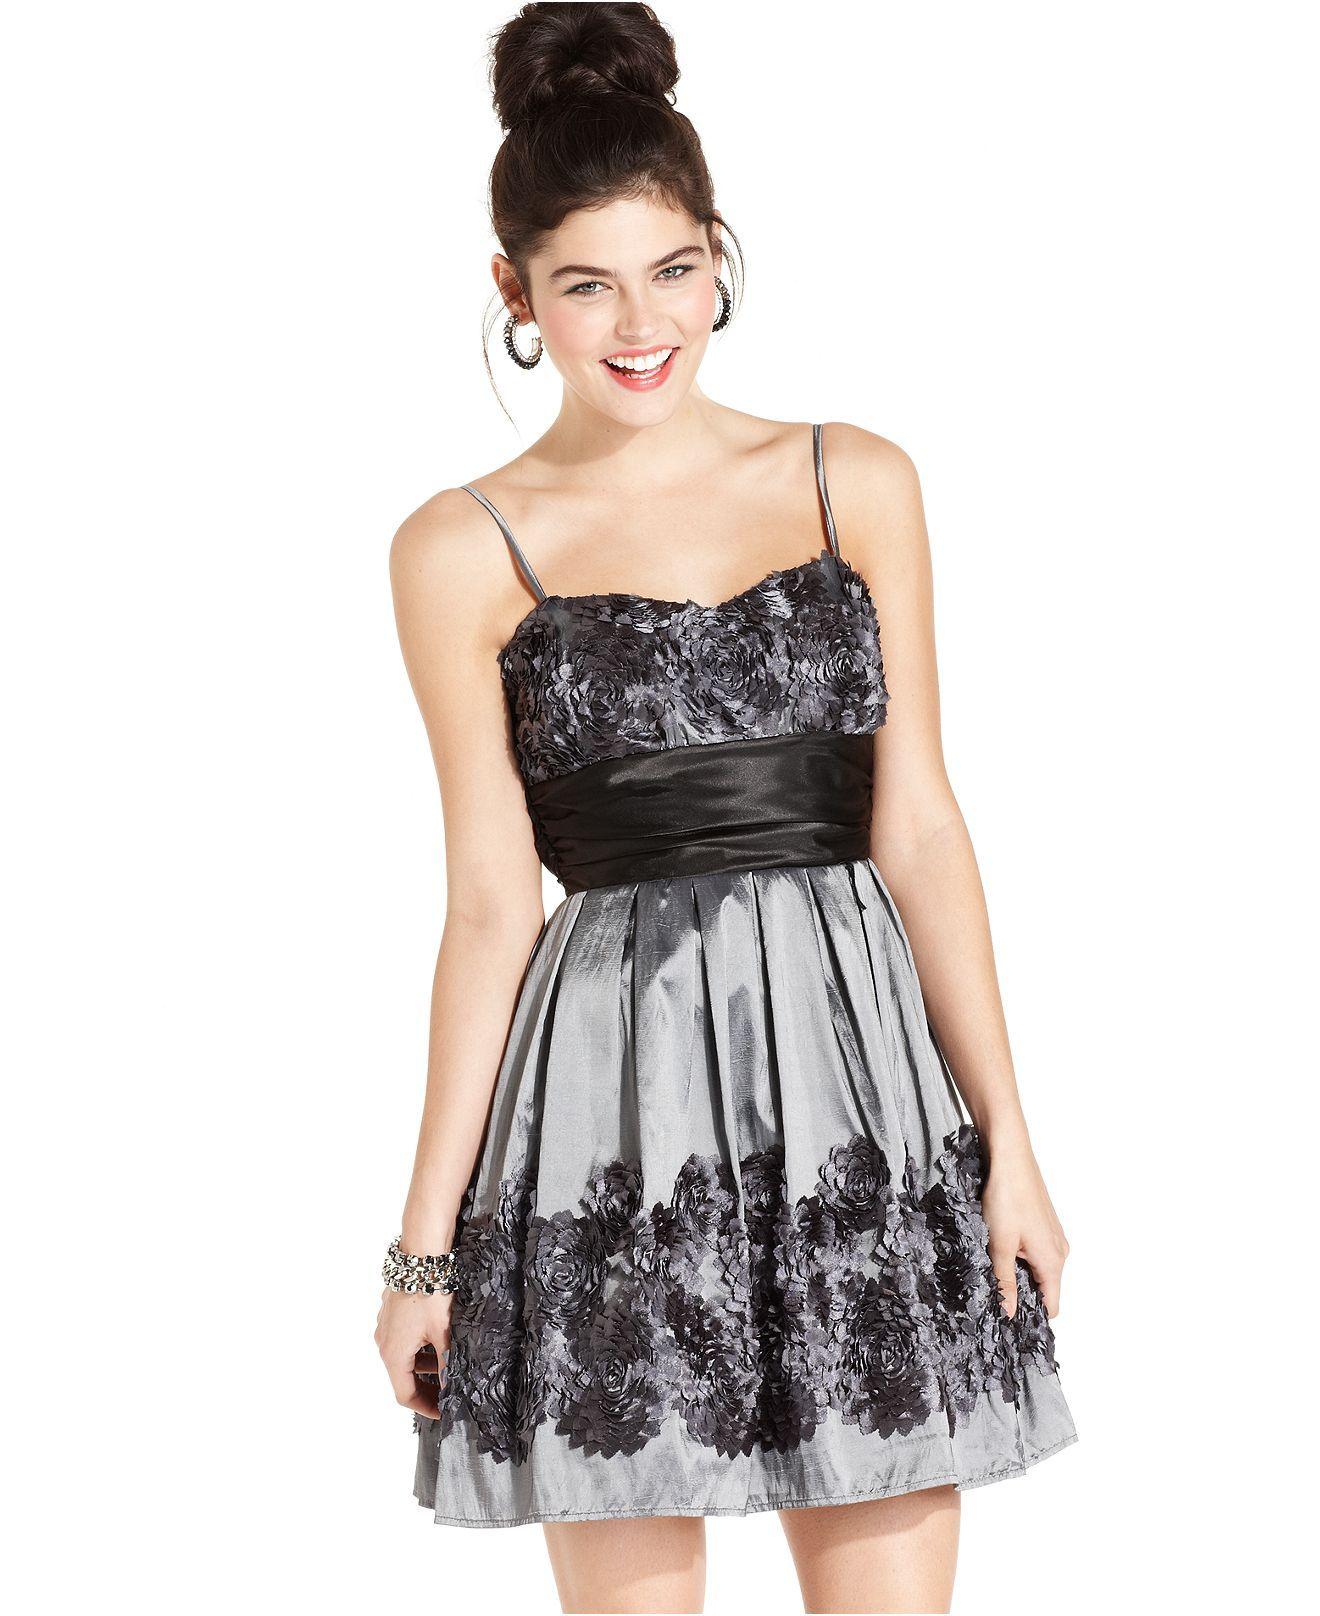 Black rose dress junior dresses dress hairstyles